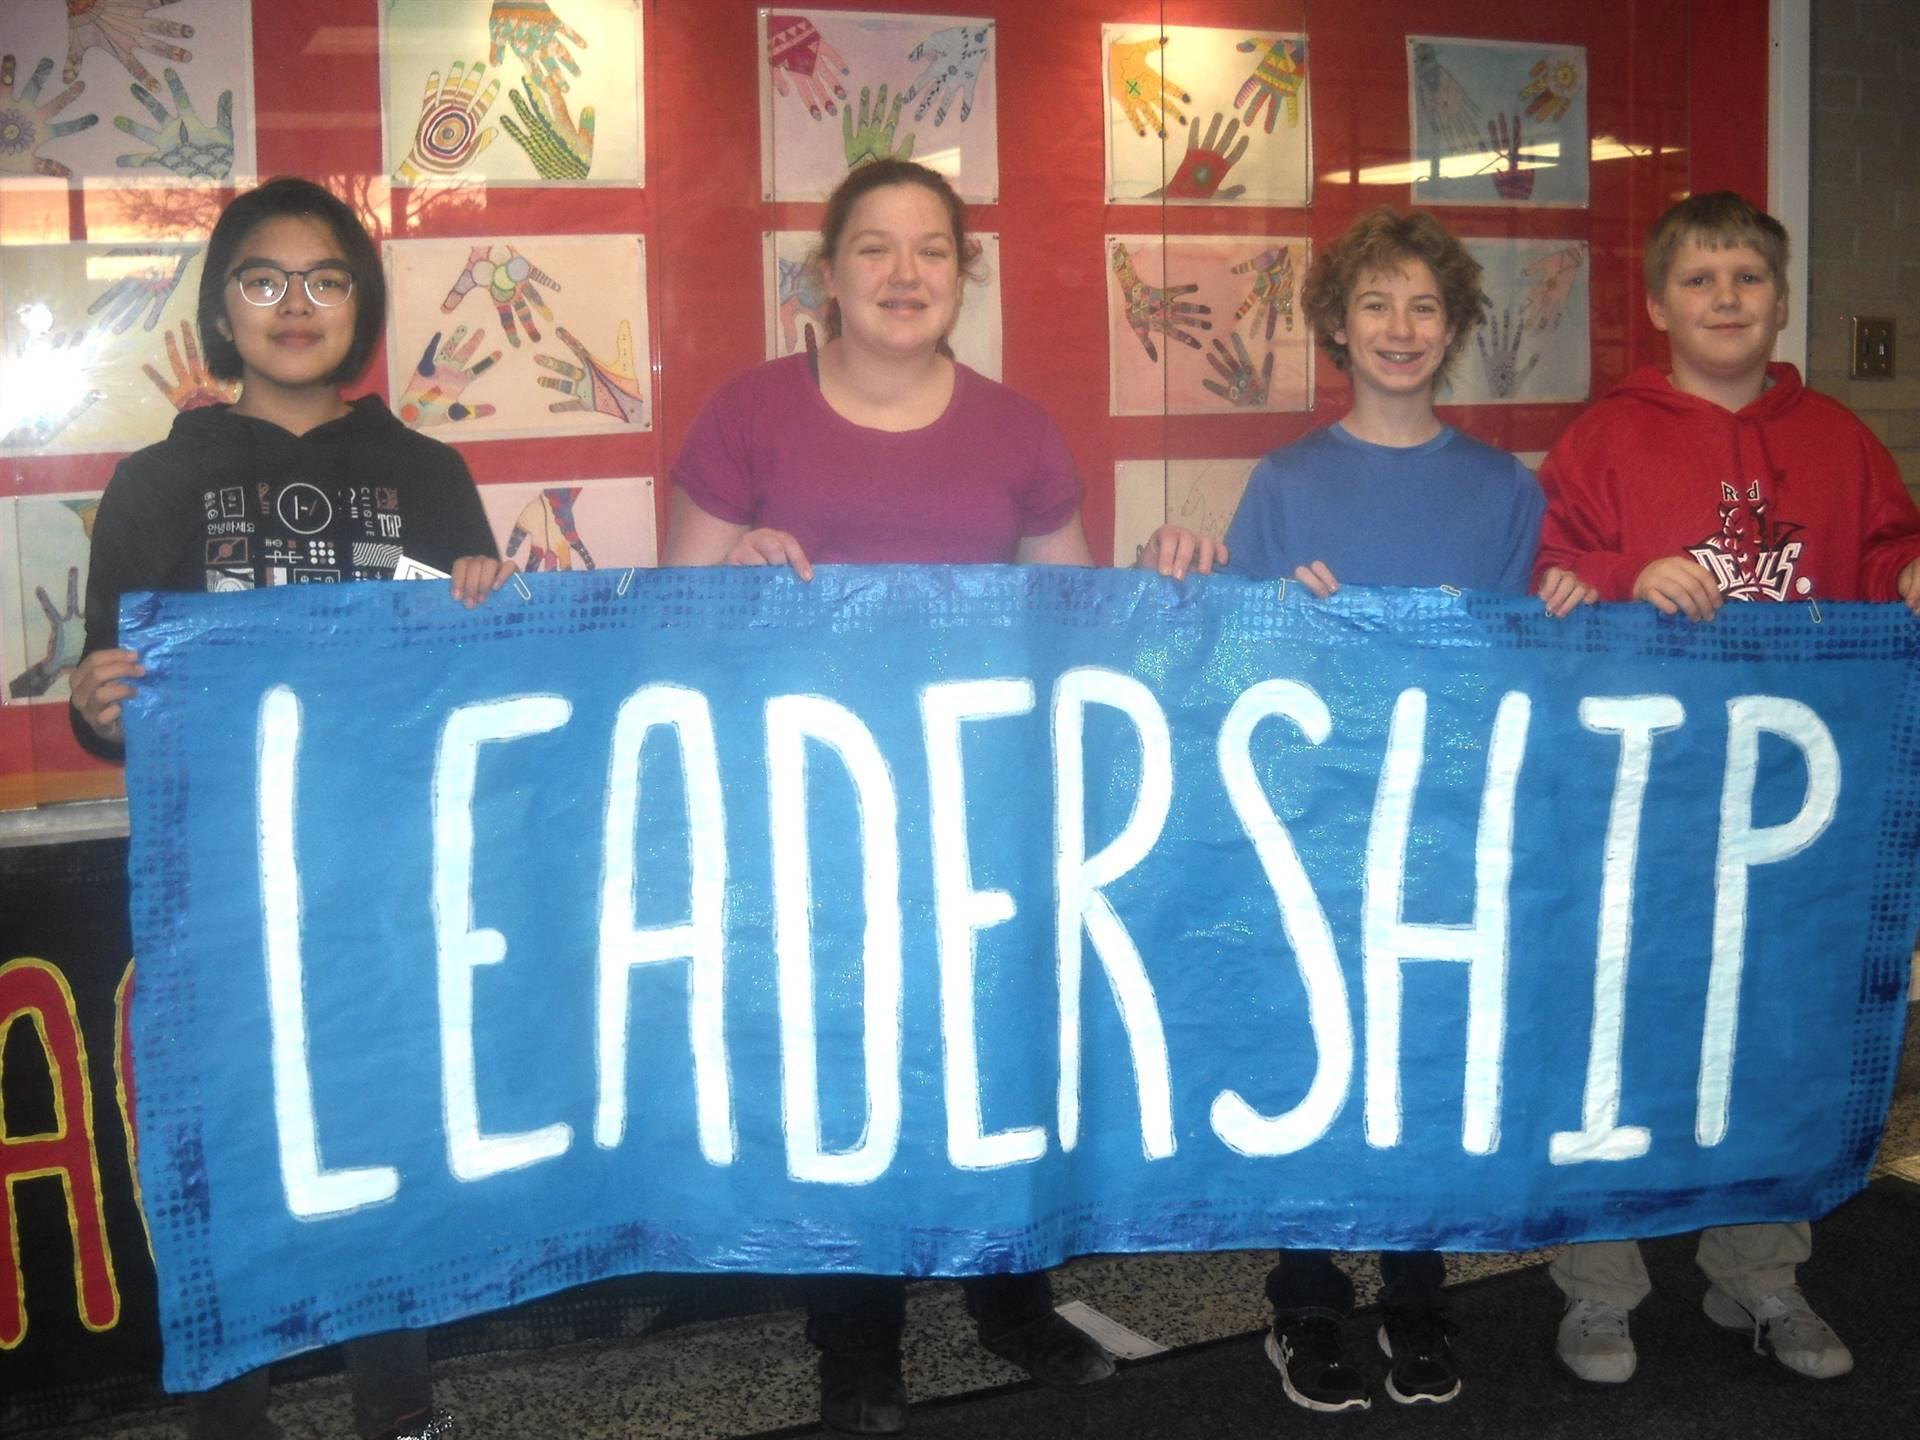 leadership 7th